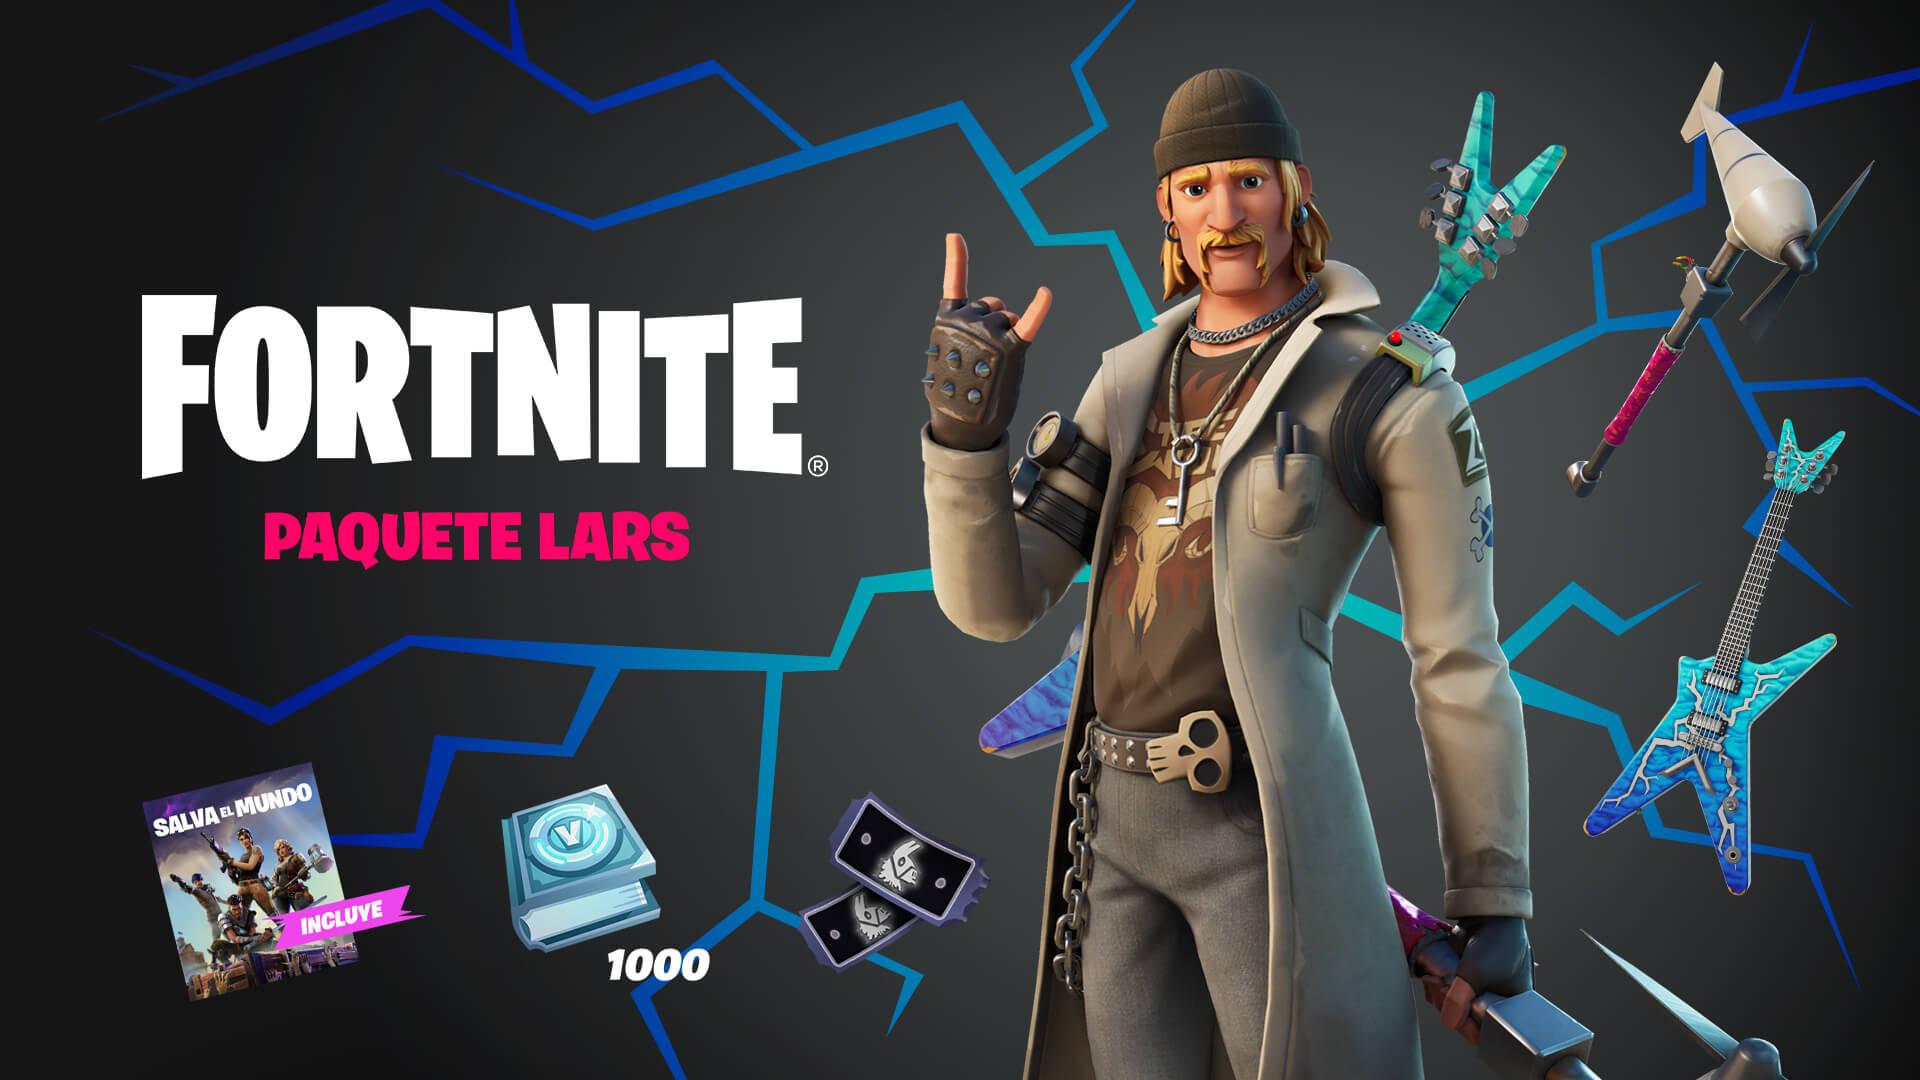 esmx-fortnite-save-the-world-lars-pack